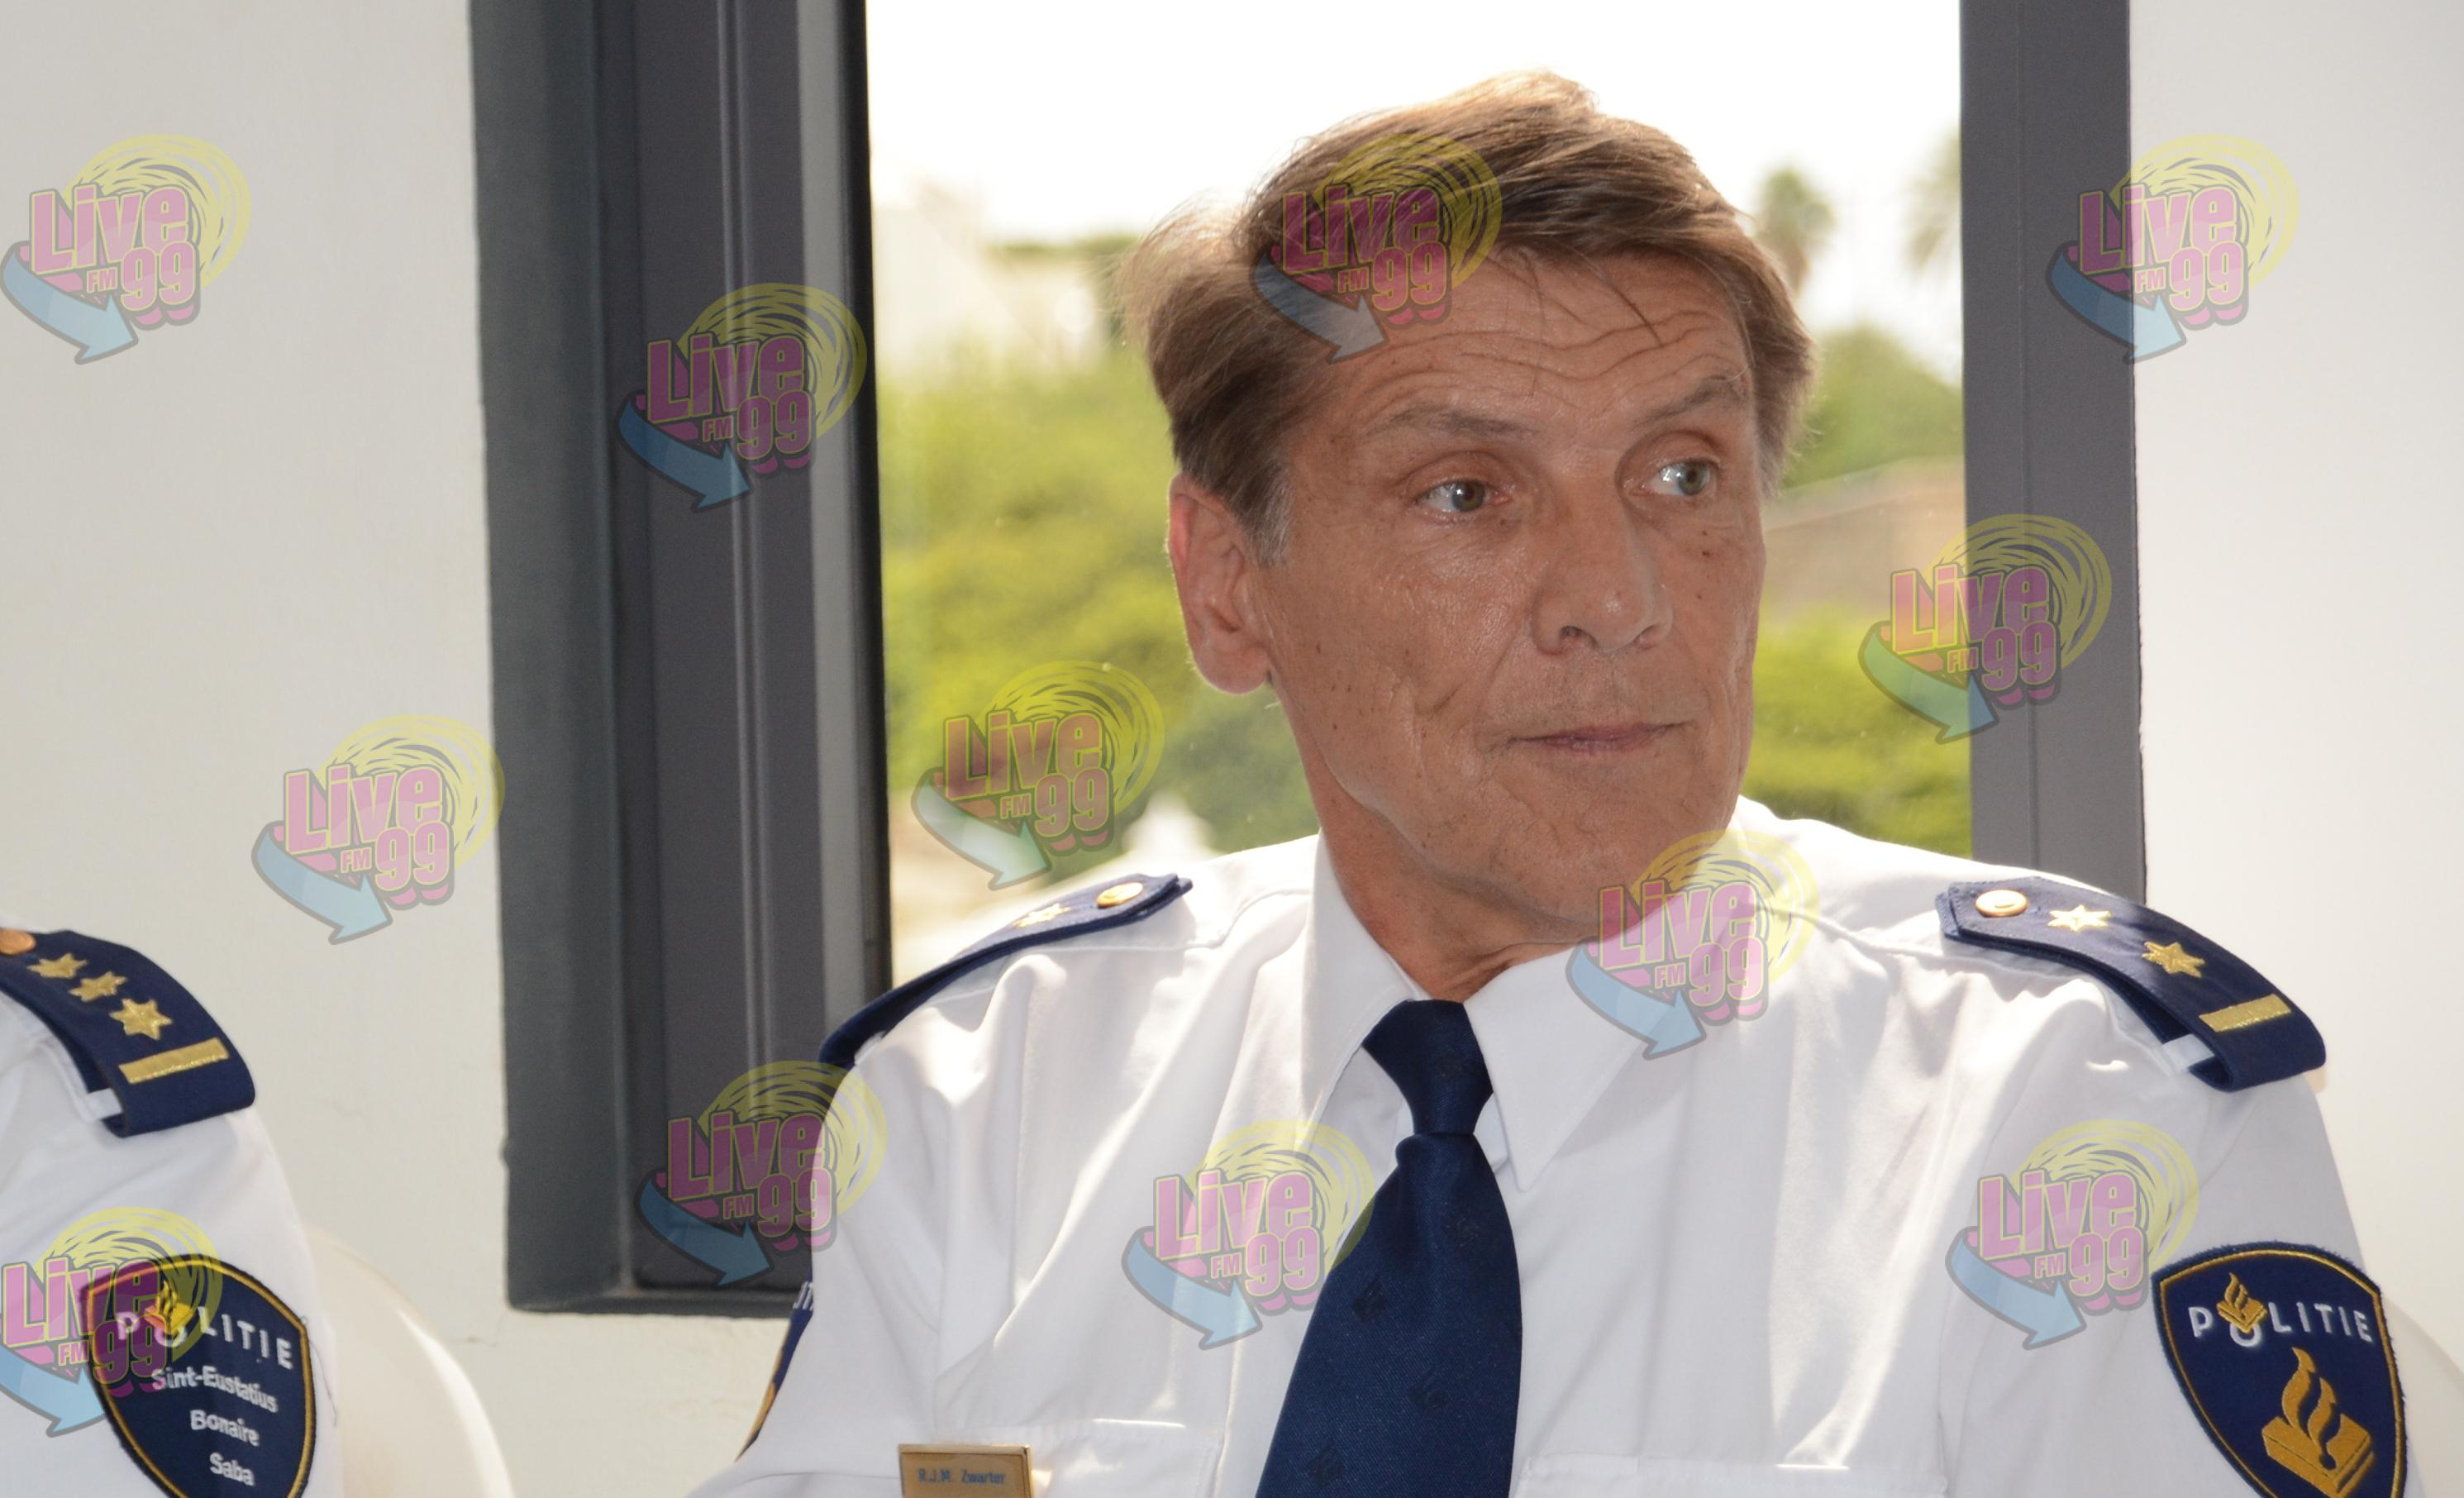 RONALD ZWARTER, HEFE SUPLENTE NOBO DI KUERPO POLISIAL KARIBE HULANDES.